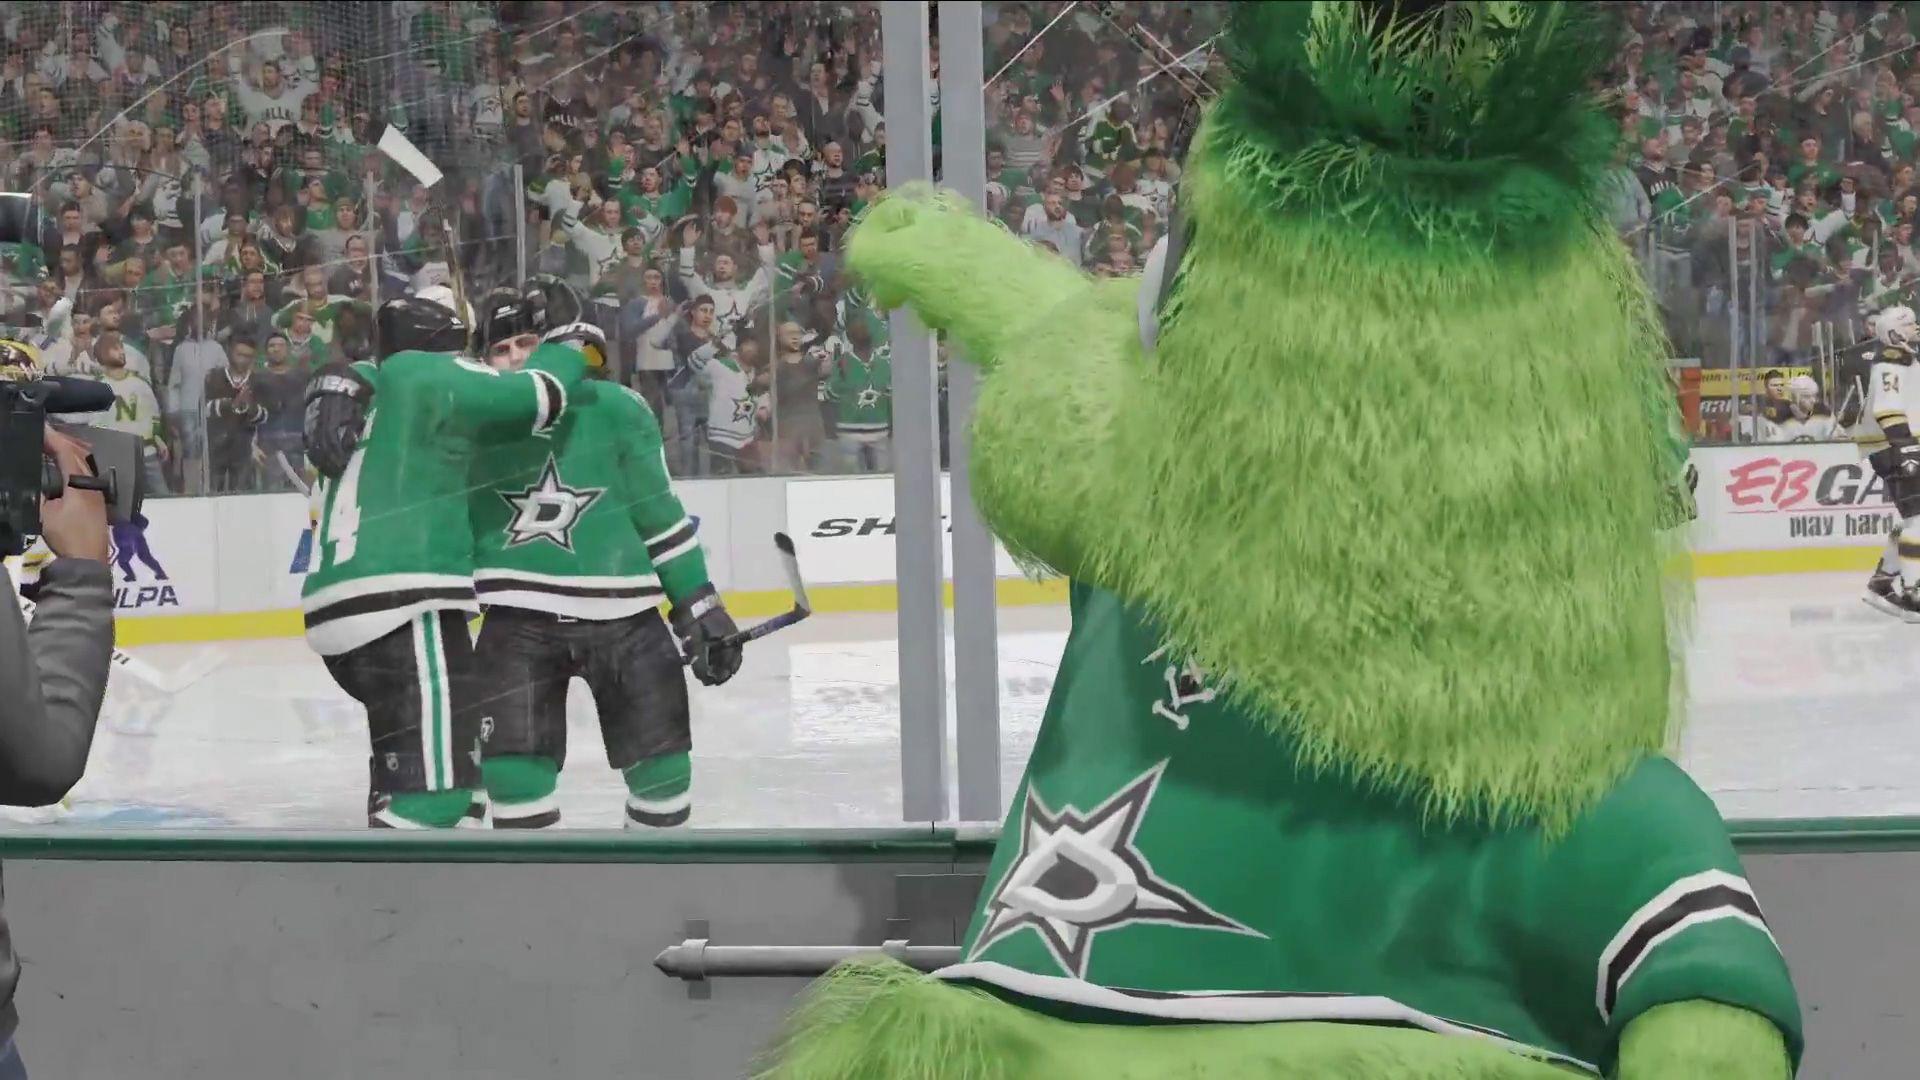 NHL 16 videos show subtle gameplay tweaks that make the game look more like hockey